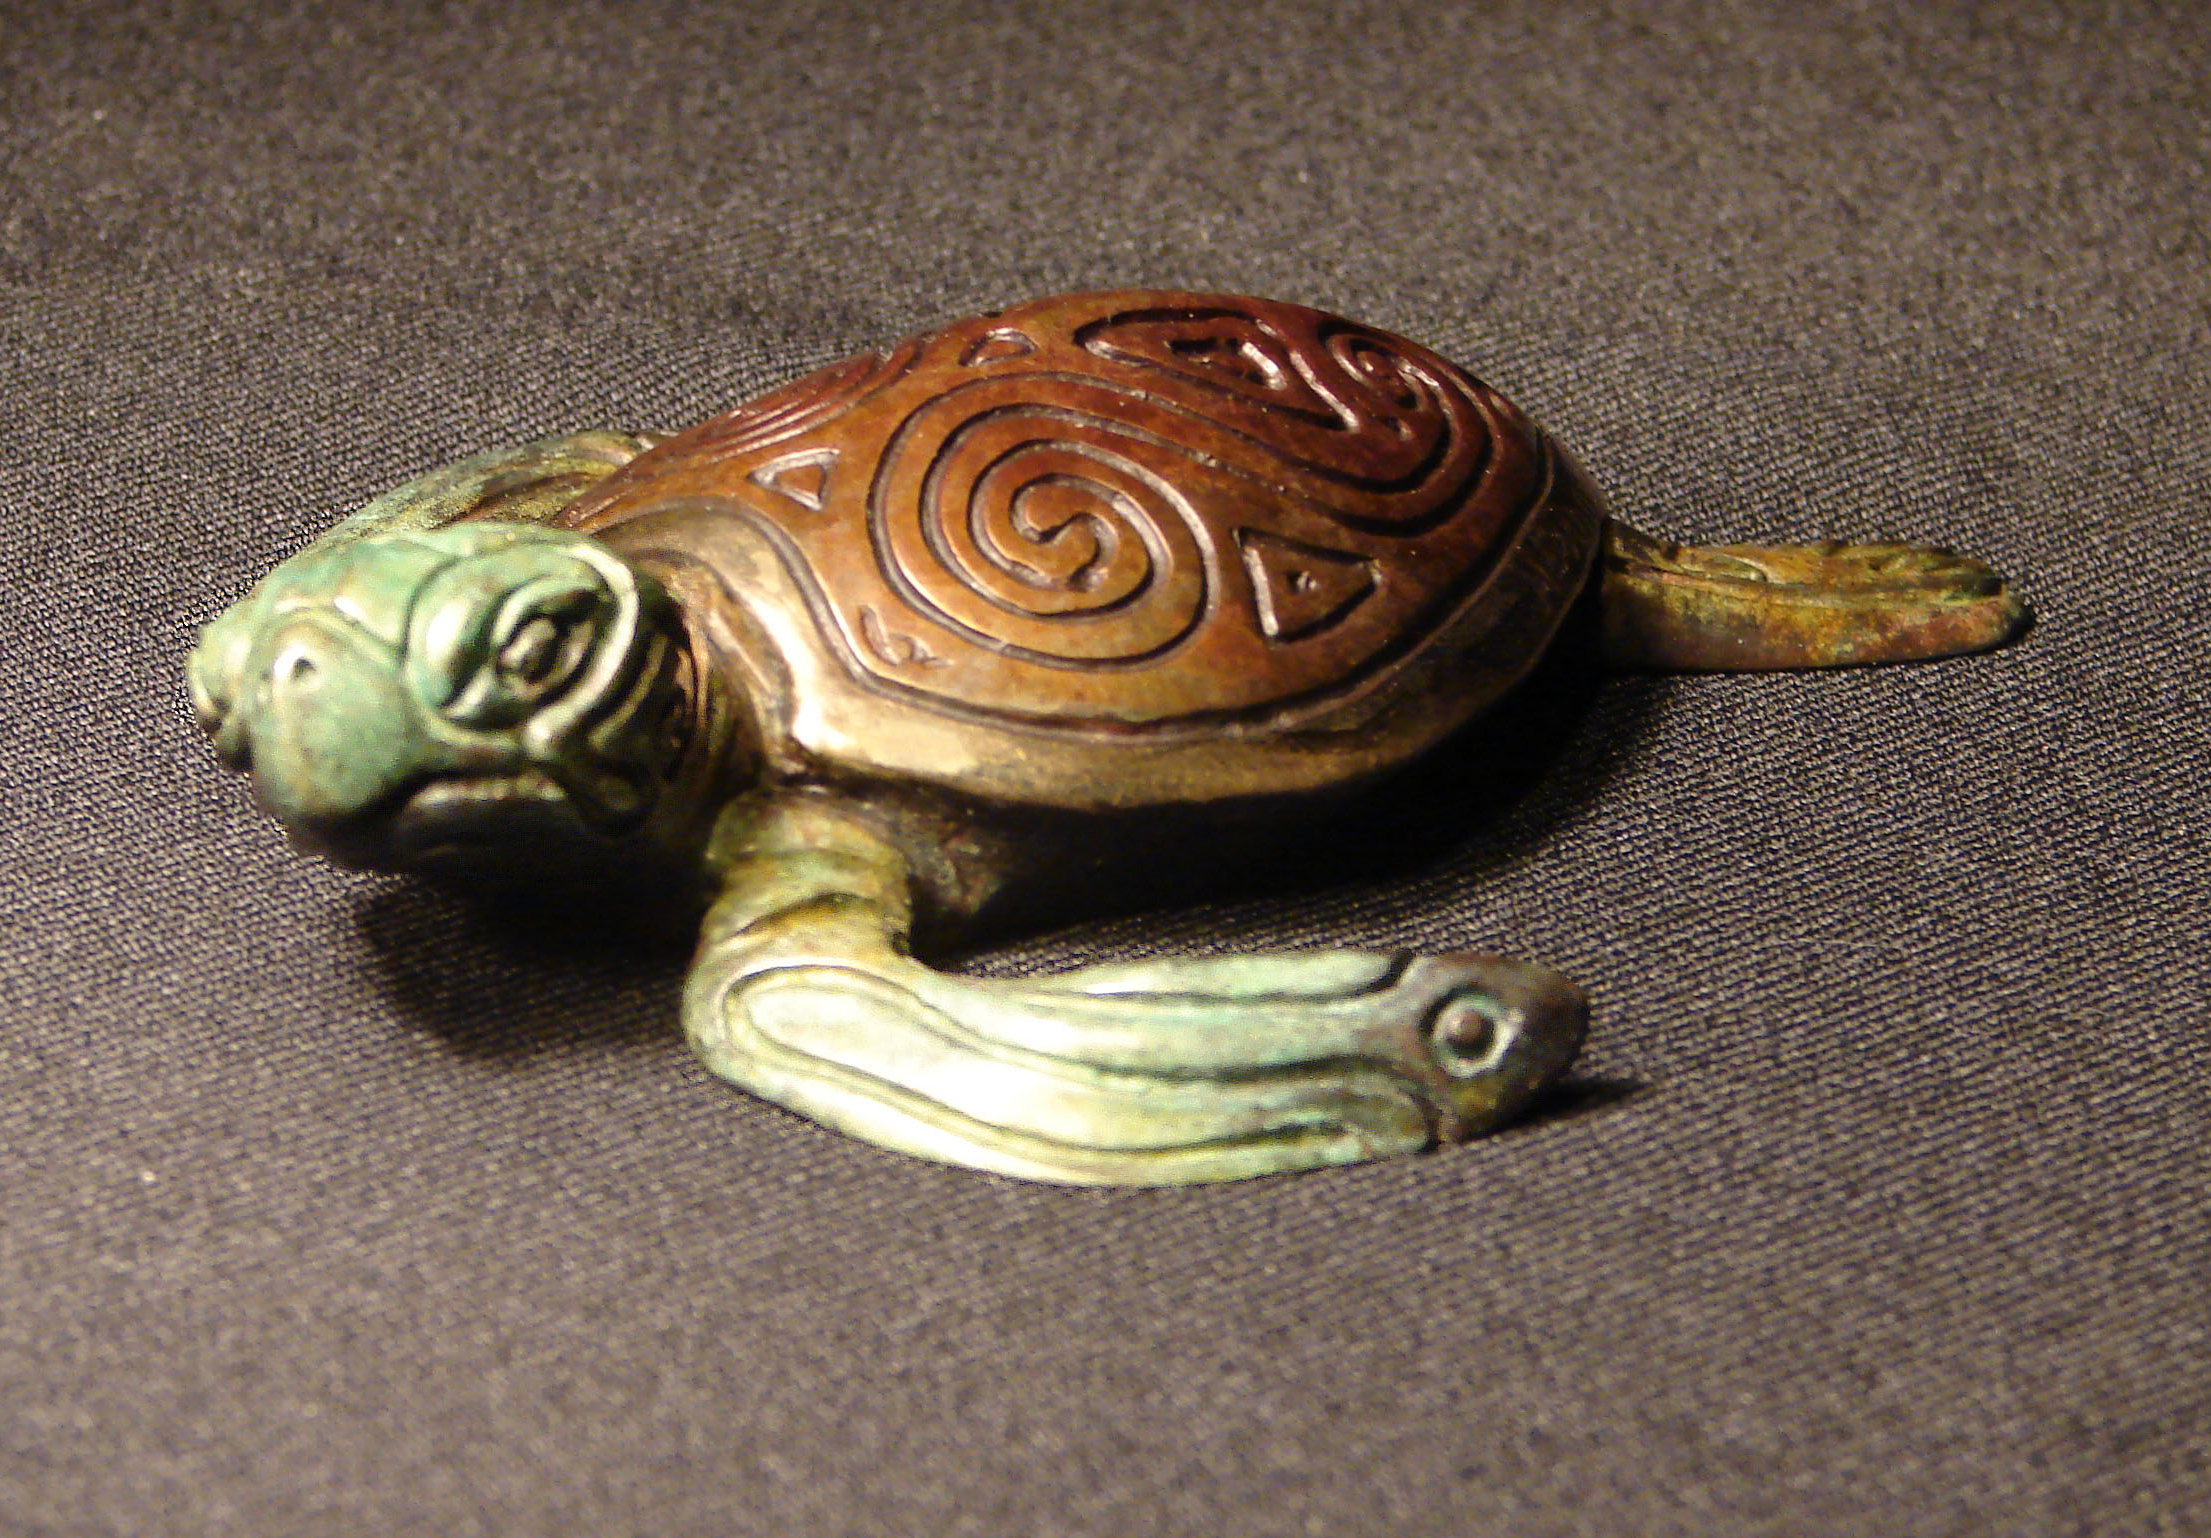 bronze-sea-turtle-sculpture-john-maisano-3.jpg